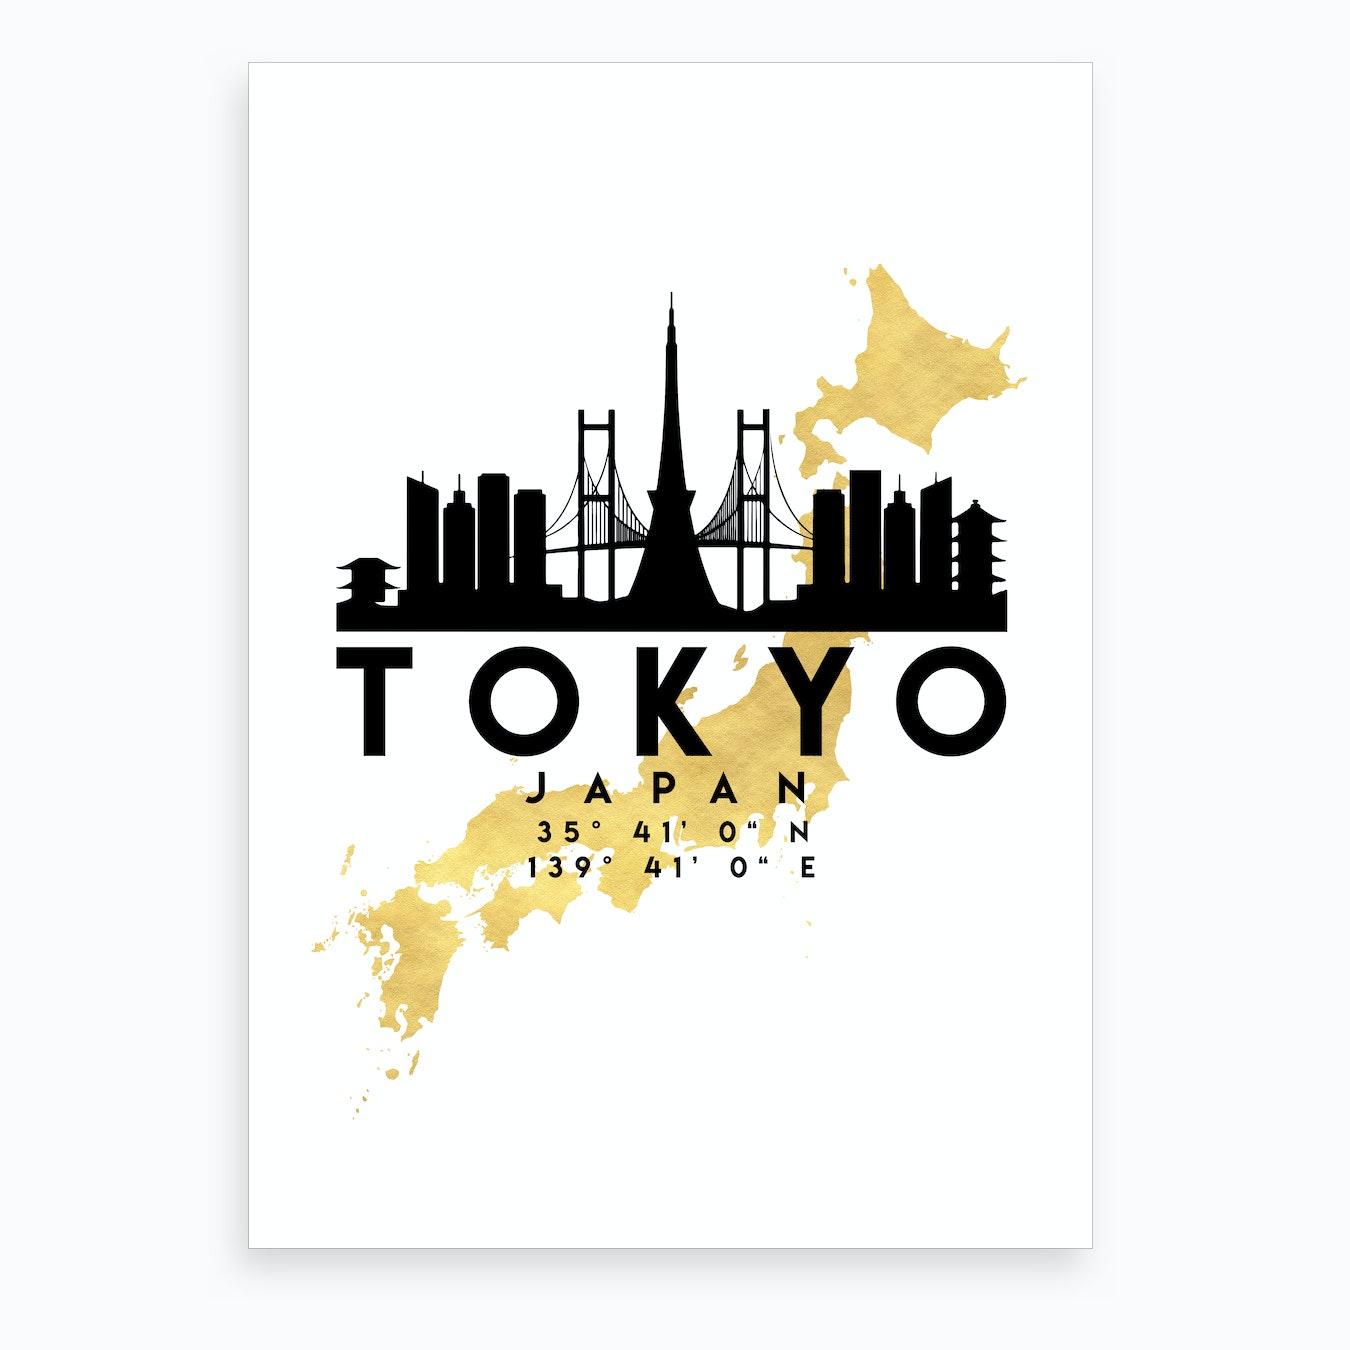 Tokyo Japan Silhouette City Skyline Map on hyogo japan, yokota japan, winter in japan, kawasaki japan, info about japan, world map japan, languages spoken in japan, hakone japan, kanagawa japan, nikko japan, gifu japan, takayama japan, printable map japan, honshu japan, hiroshima japan, sendai japan, mountains in japan, nagoya japan, hamamatsu japan,